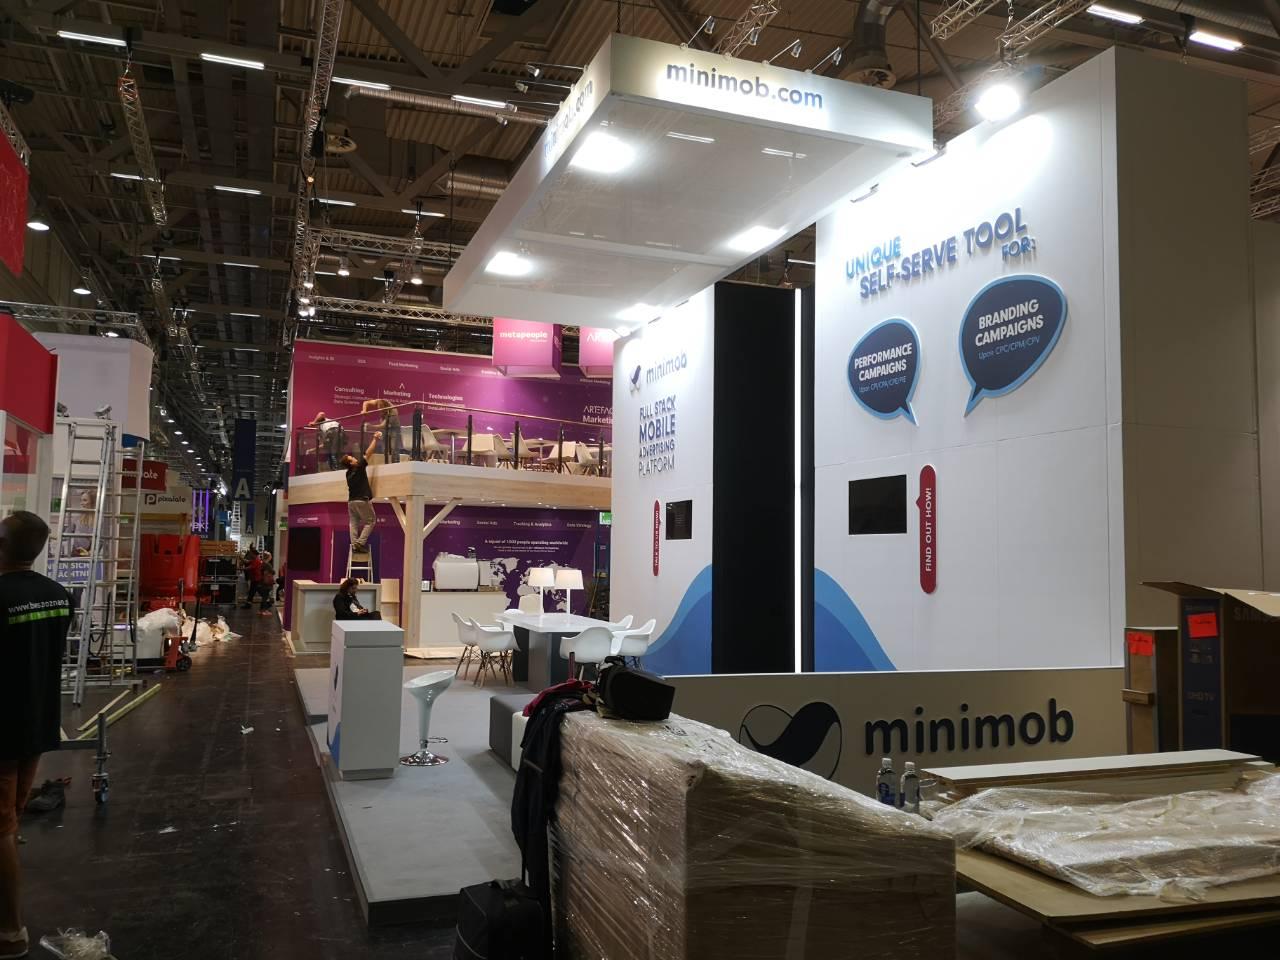 Minimob